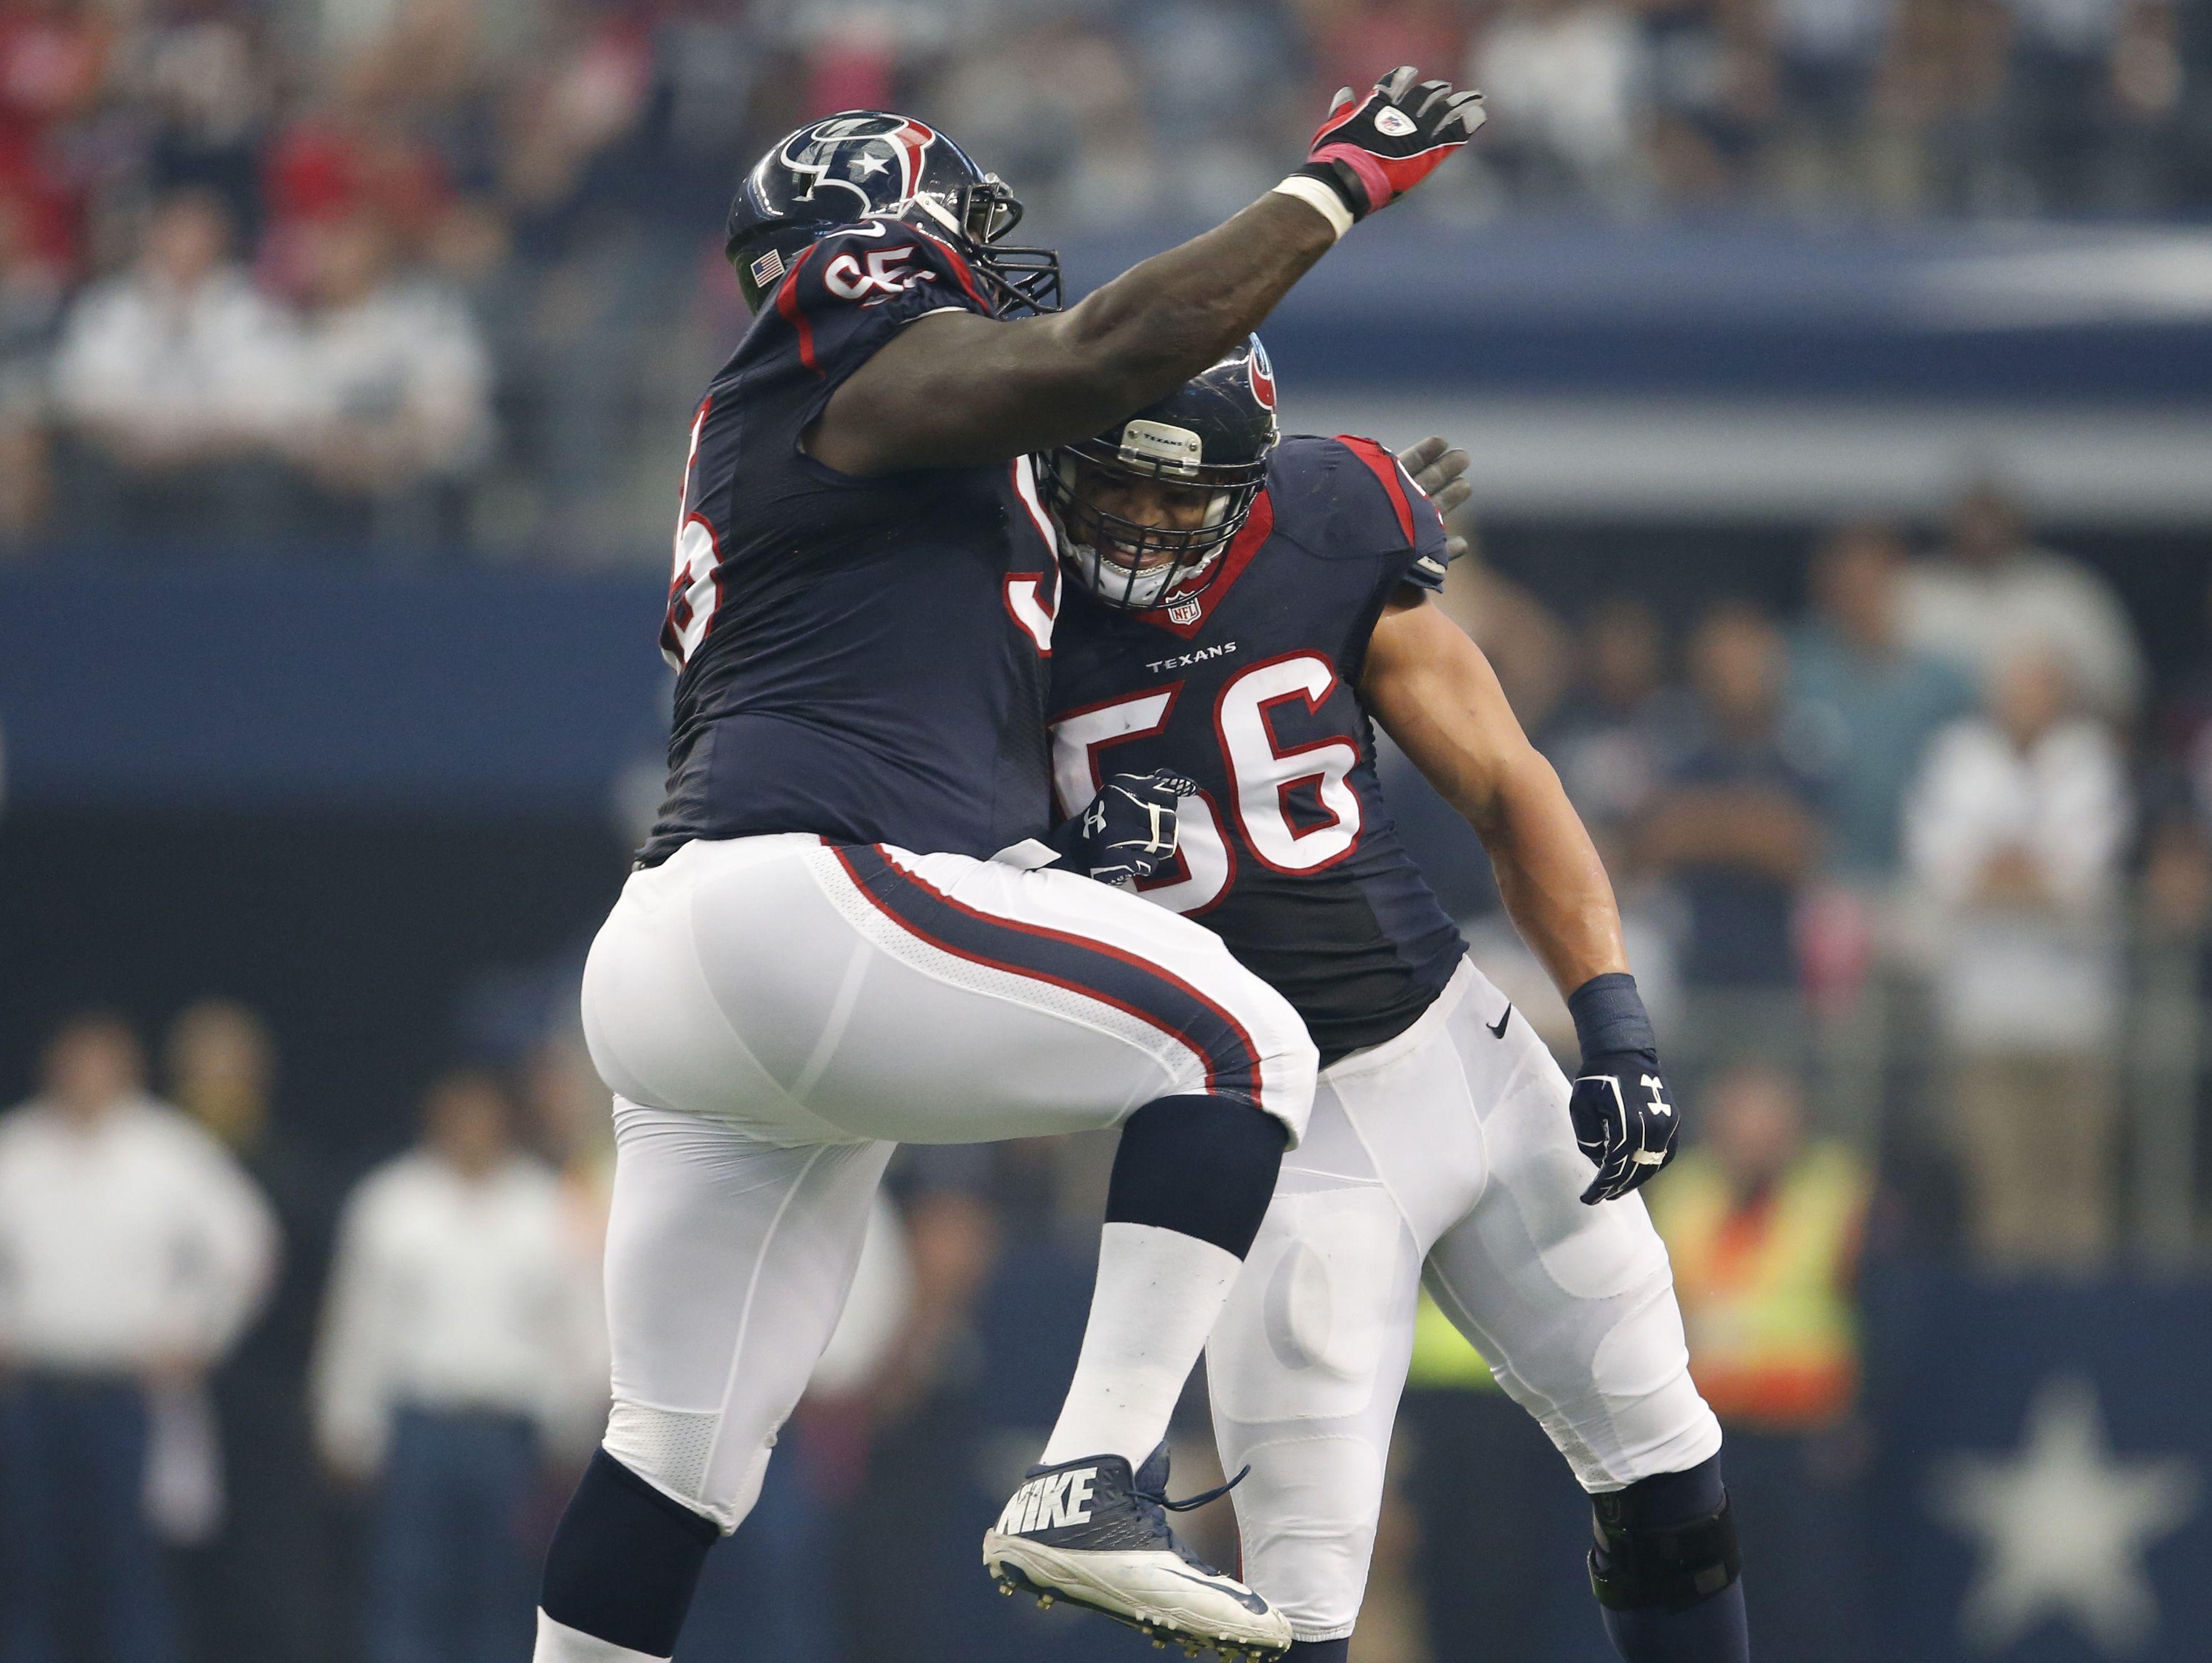 Oct 5, 2014; Arlington, TX, USA; Houston Texans linebacker